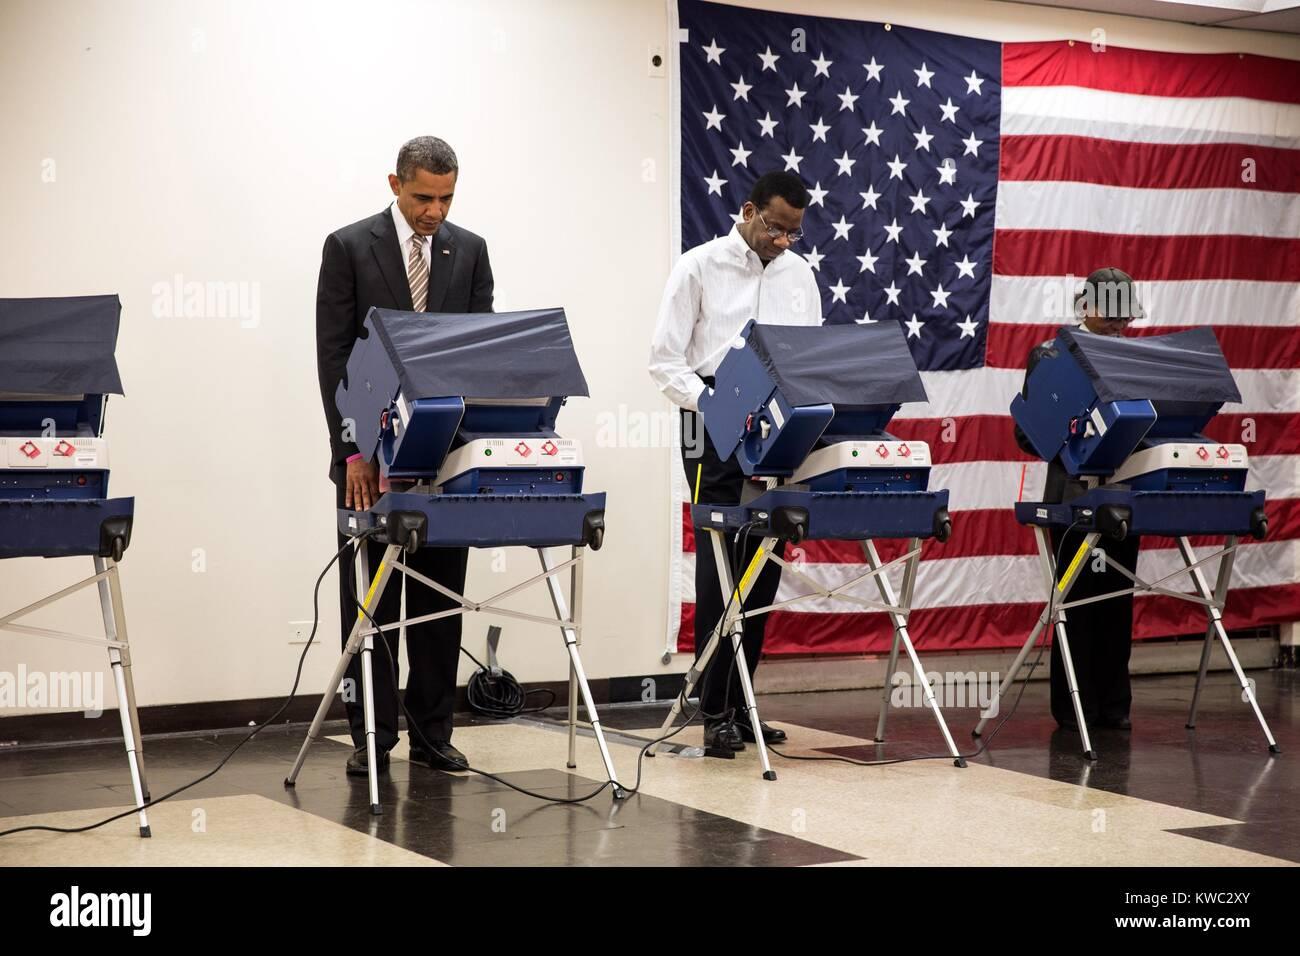 Präsident Obama stimmen bei Martin Luther King Jr. Community Center in Chicago, Illinois. Er wählte früh Stockbild